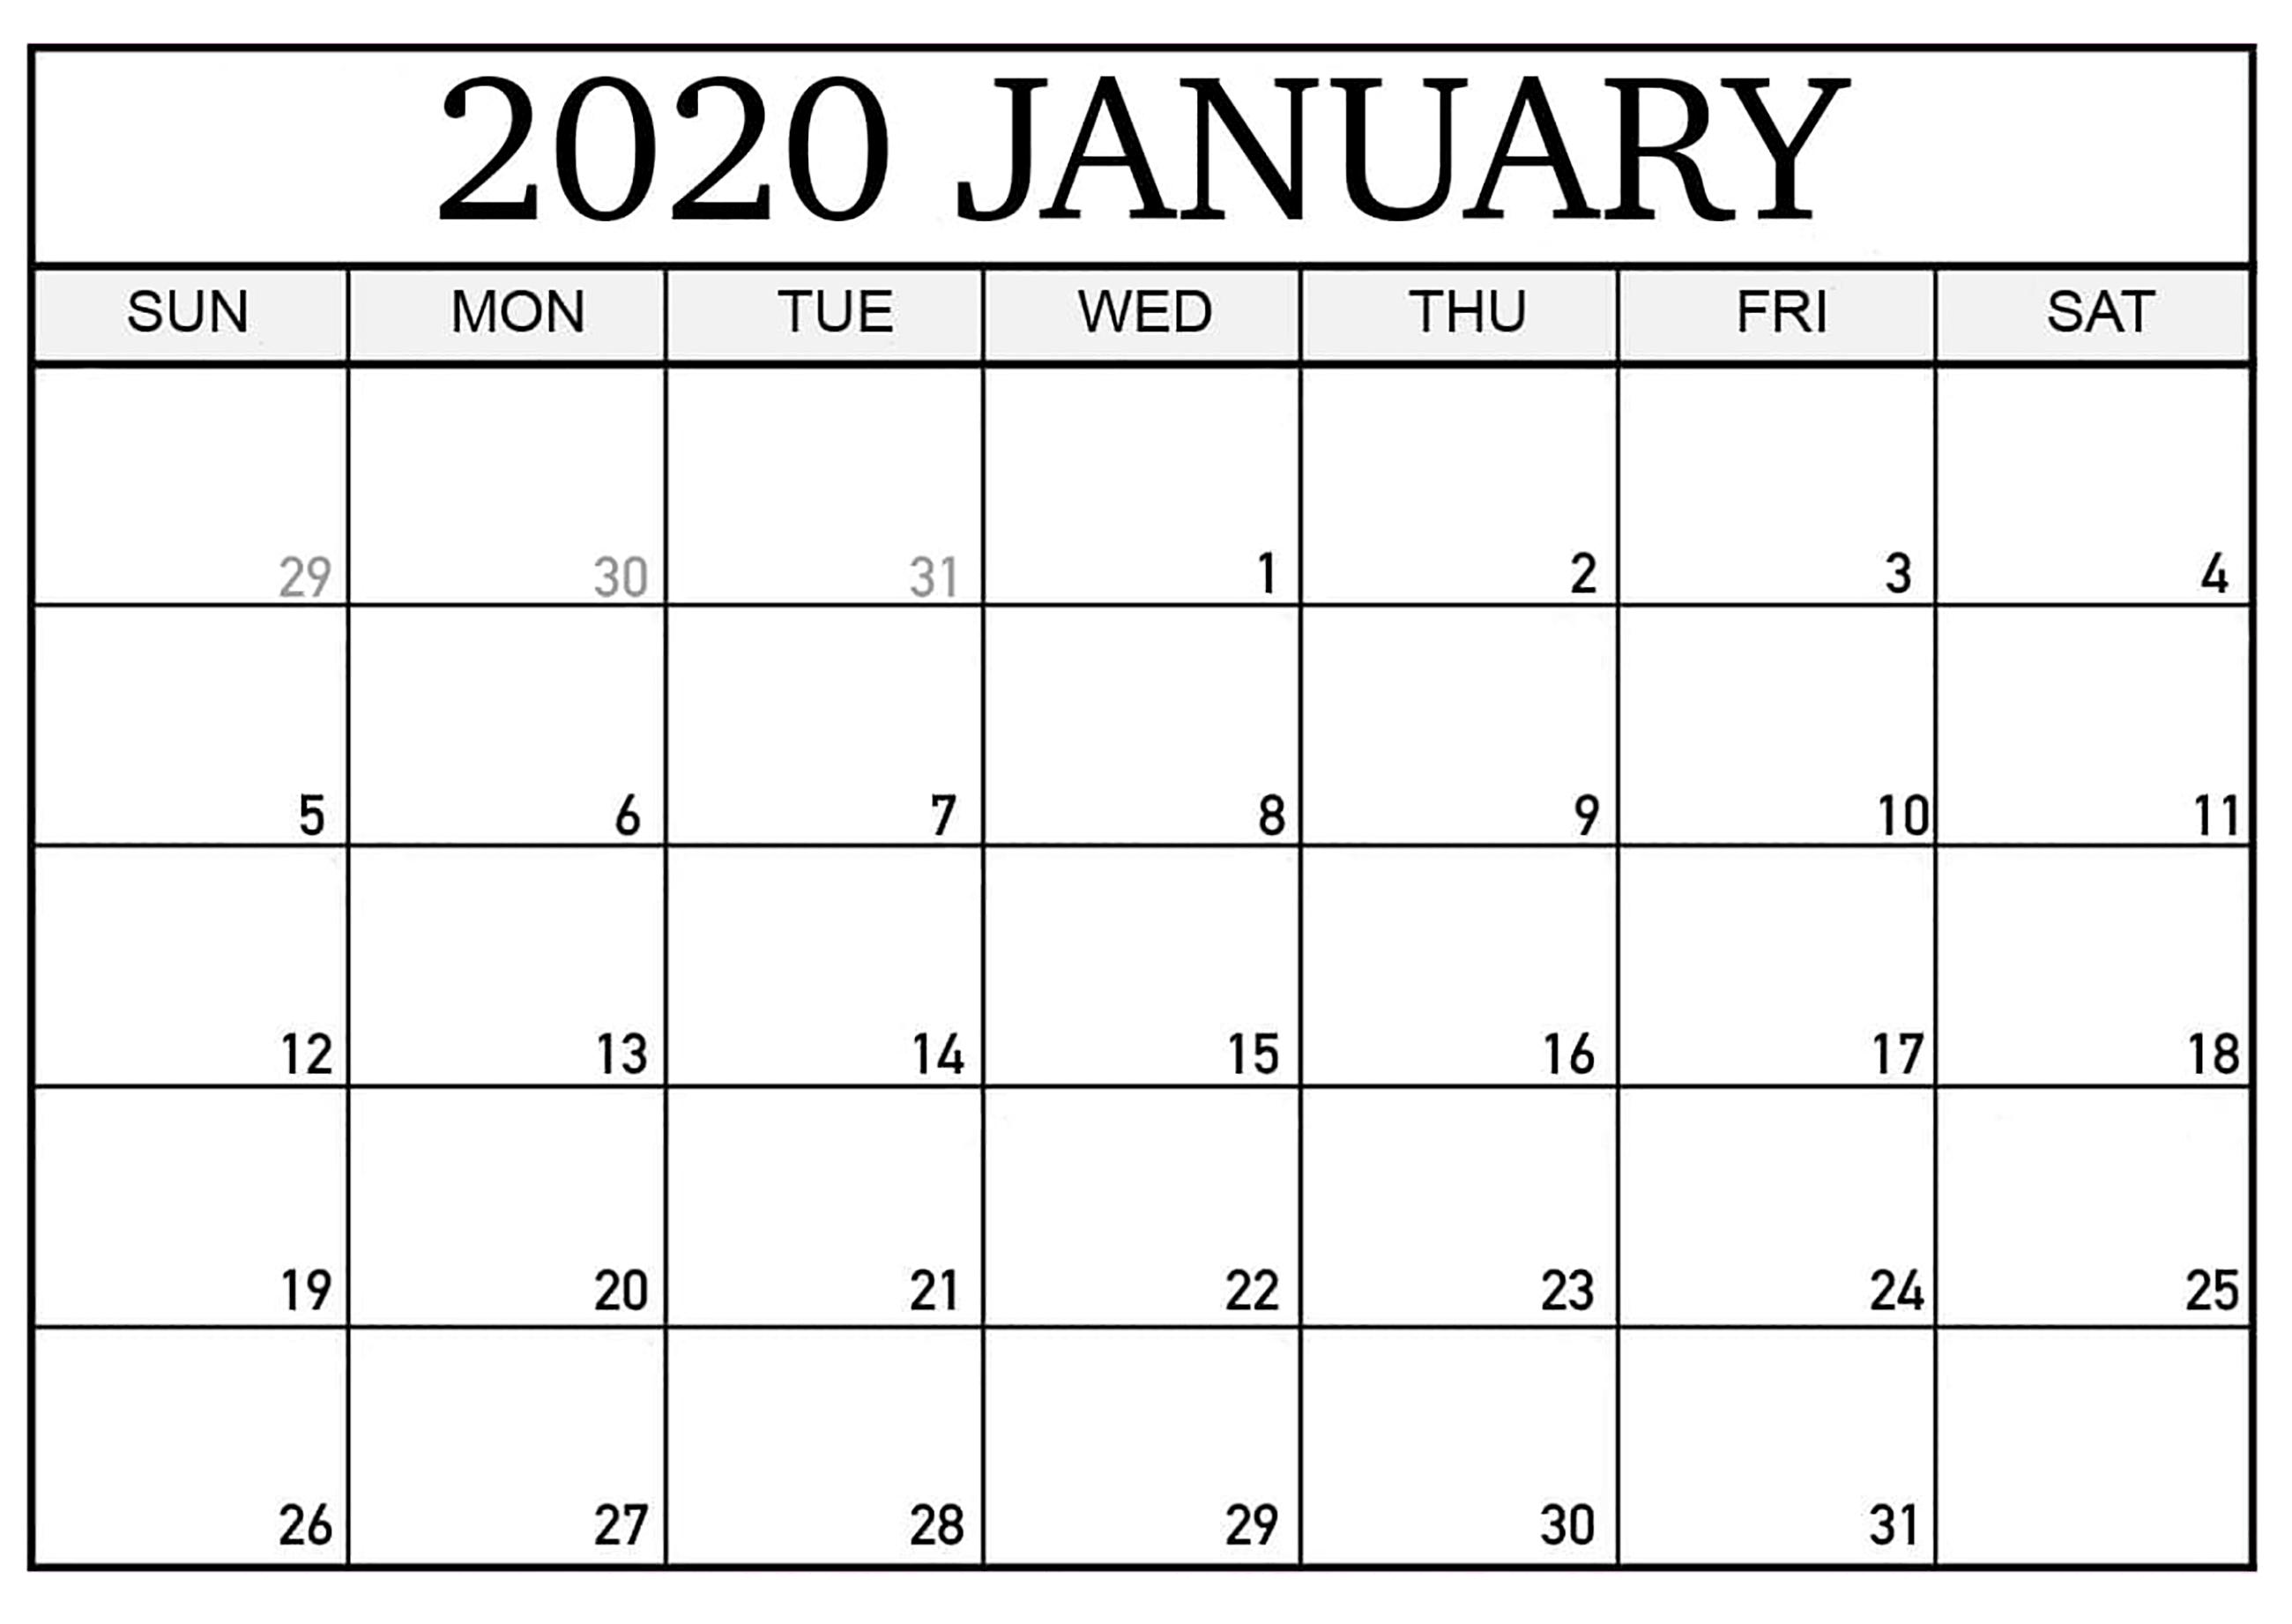 Printable Calendar January 2020 Pdf  2019 Calendars For intended for Blank January Calendar 2020